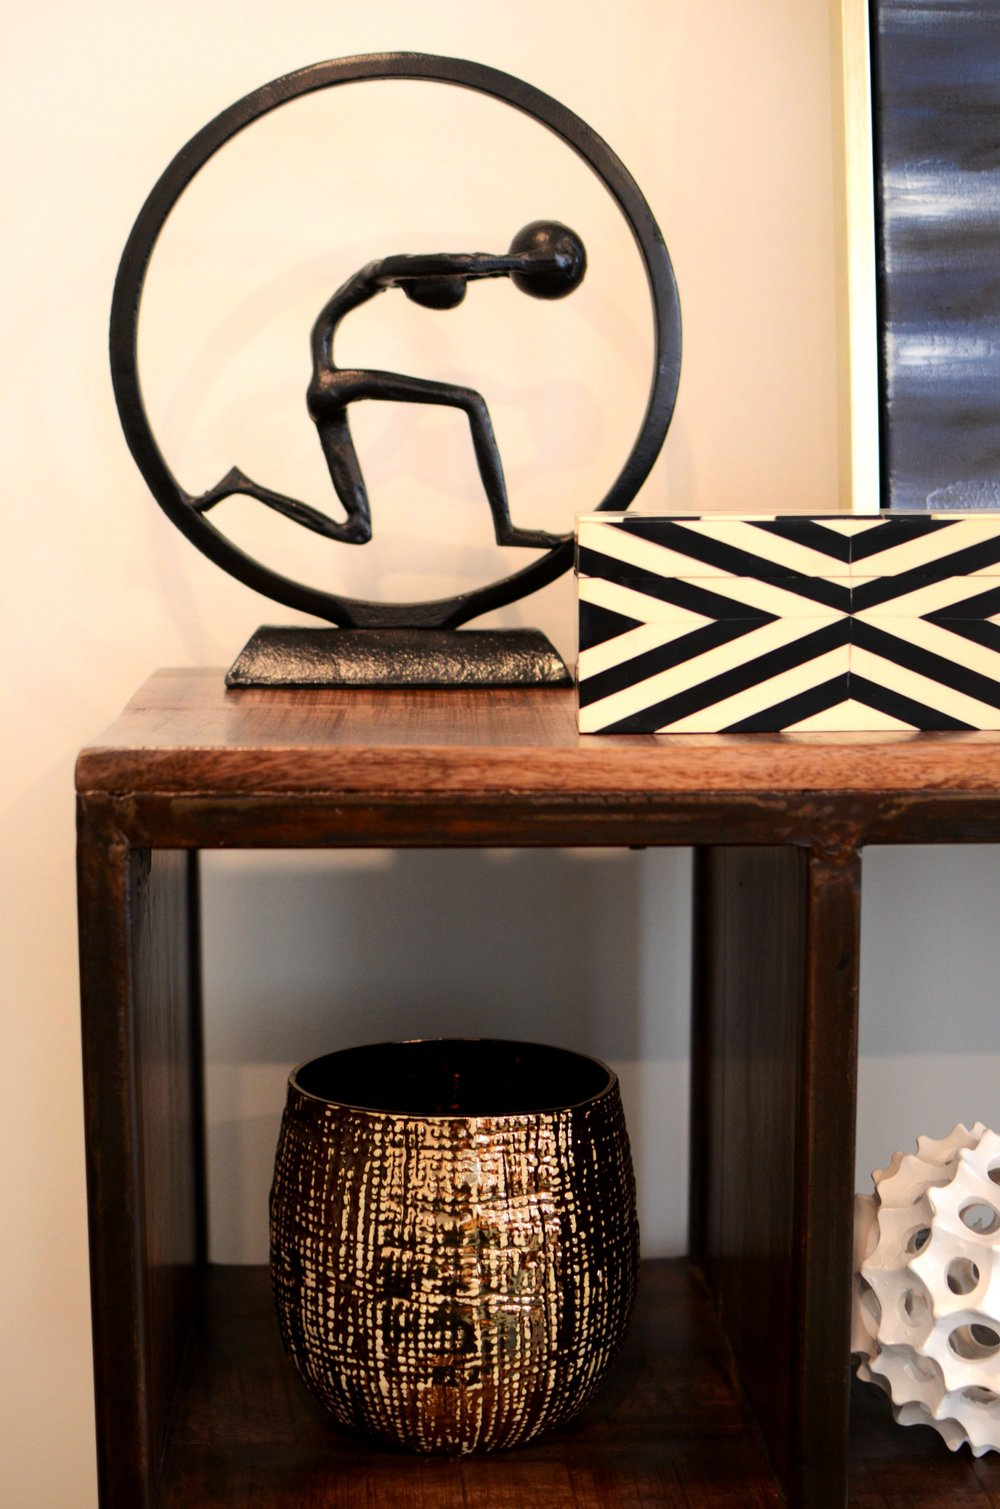 calgary-interior-designer-family-room-decor-5.jpg